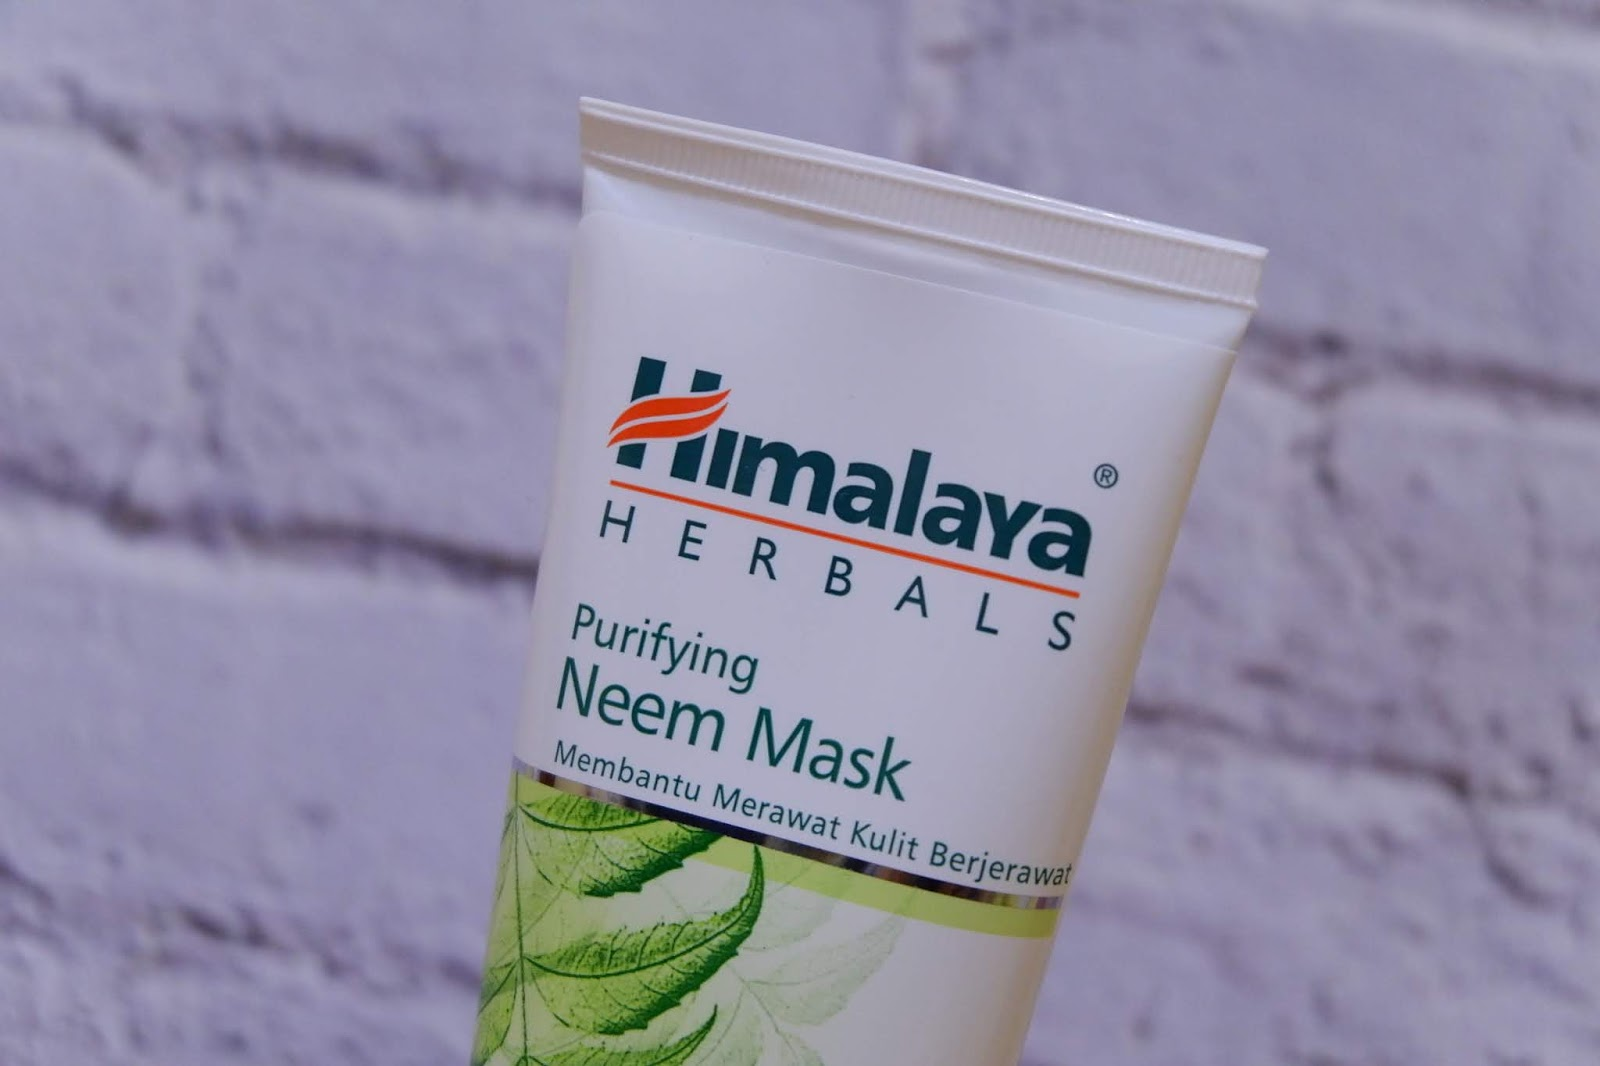 Review Himalaya Herbals Purifying Neem Mask Kata Berkata